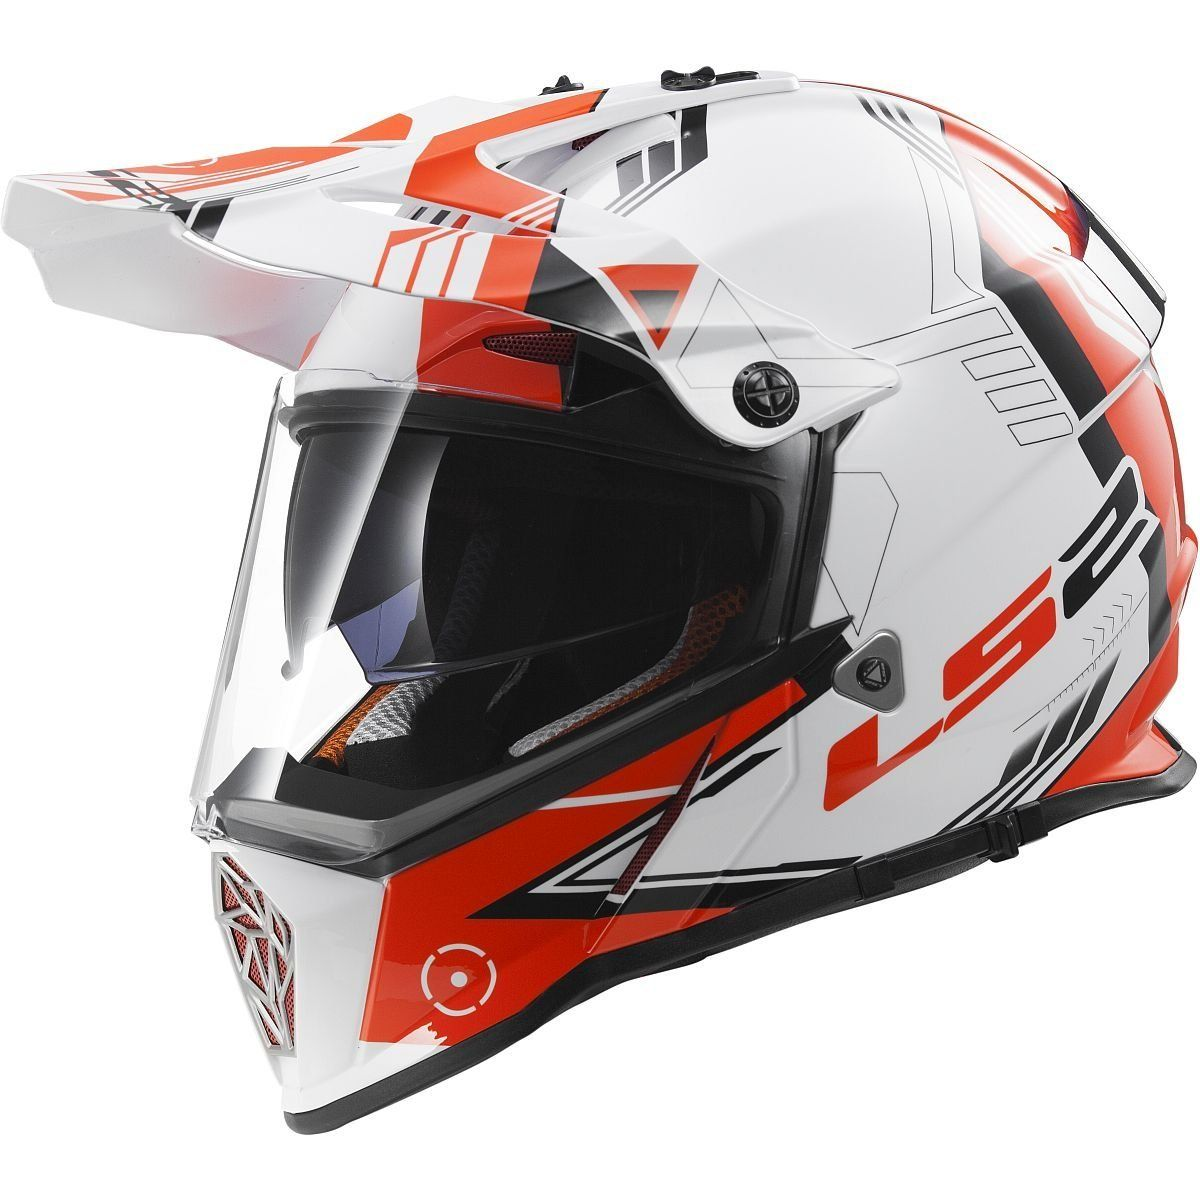 Best Adventure Motorcycle Helmet For 2020 Top 5 Models Compared